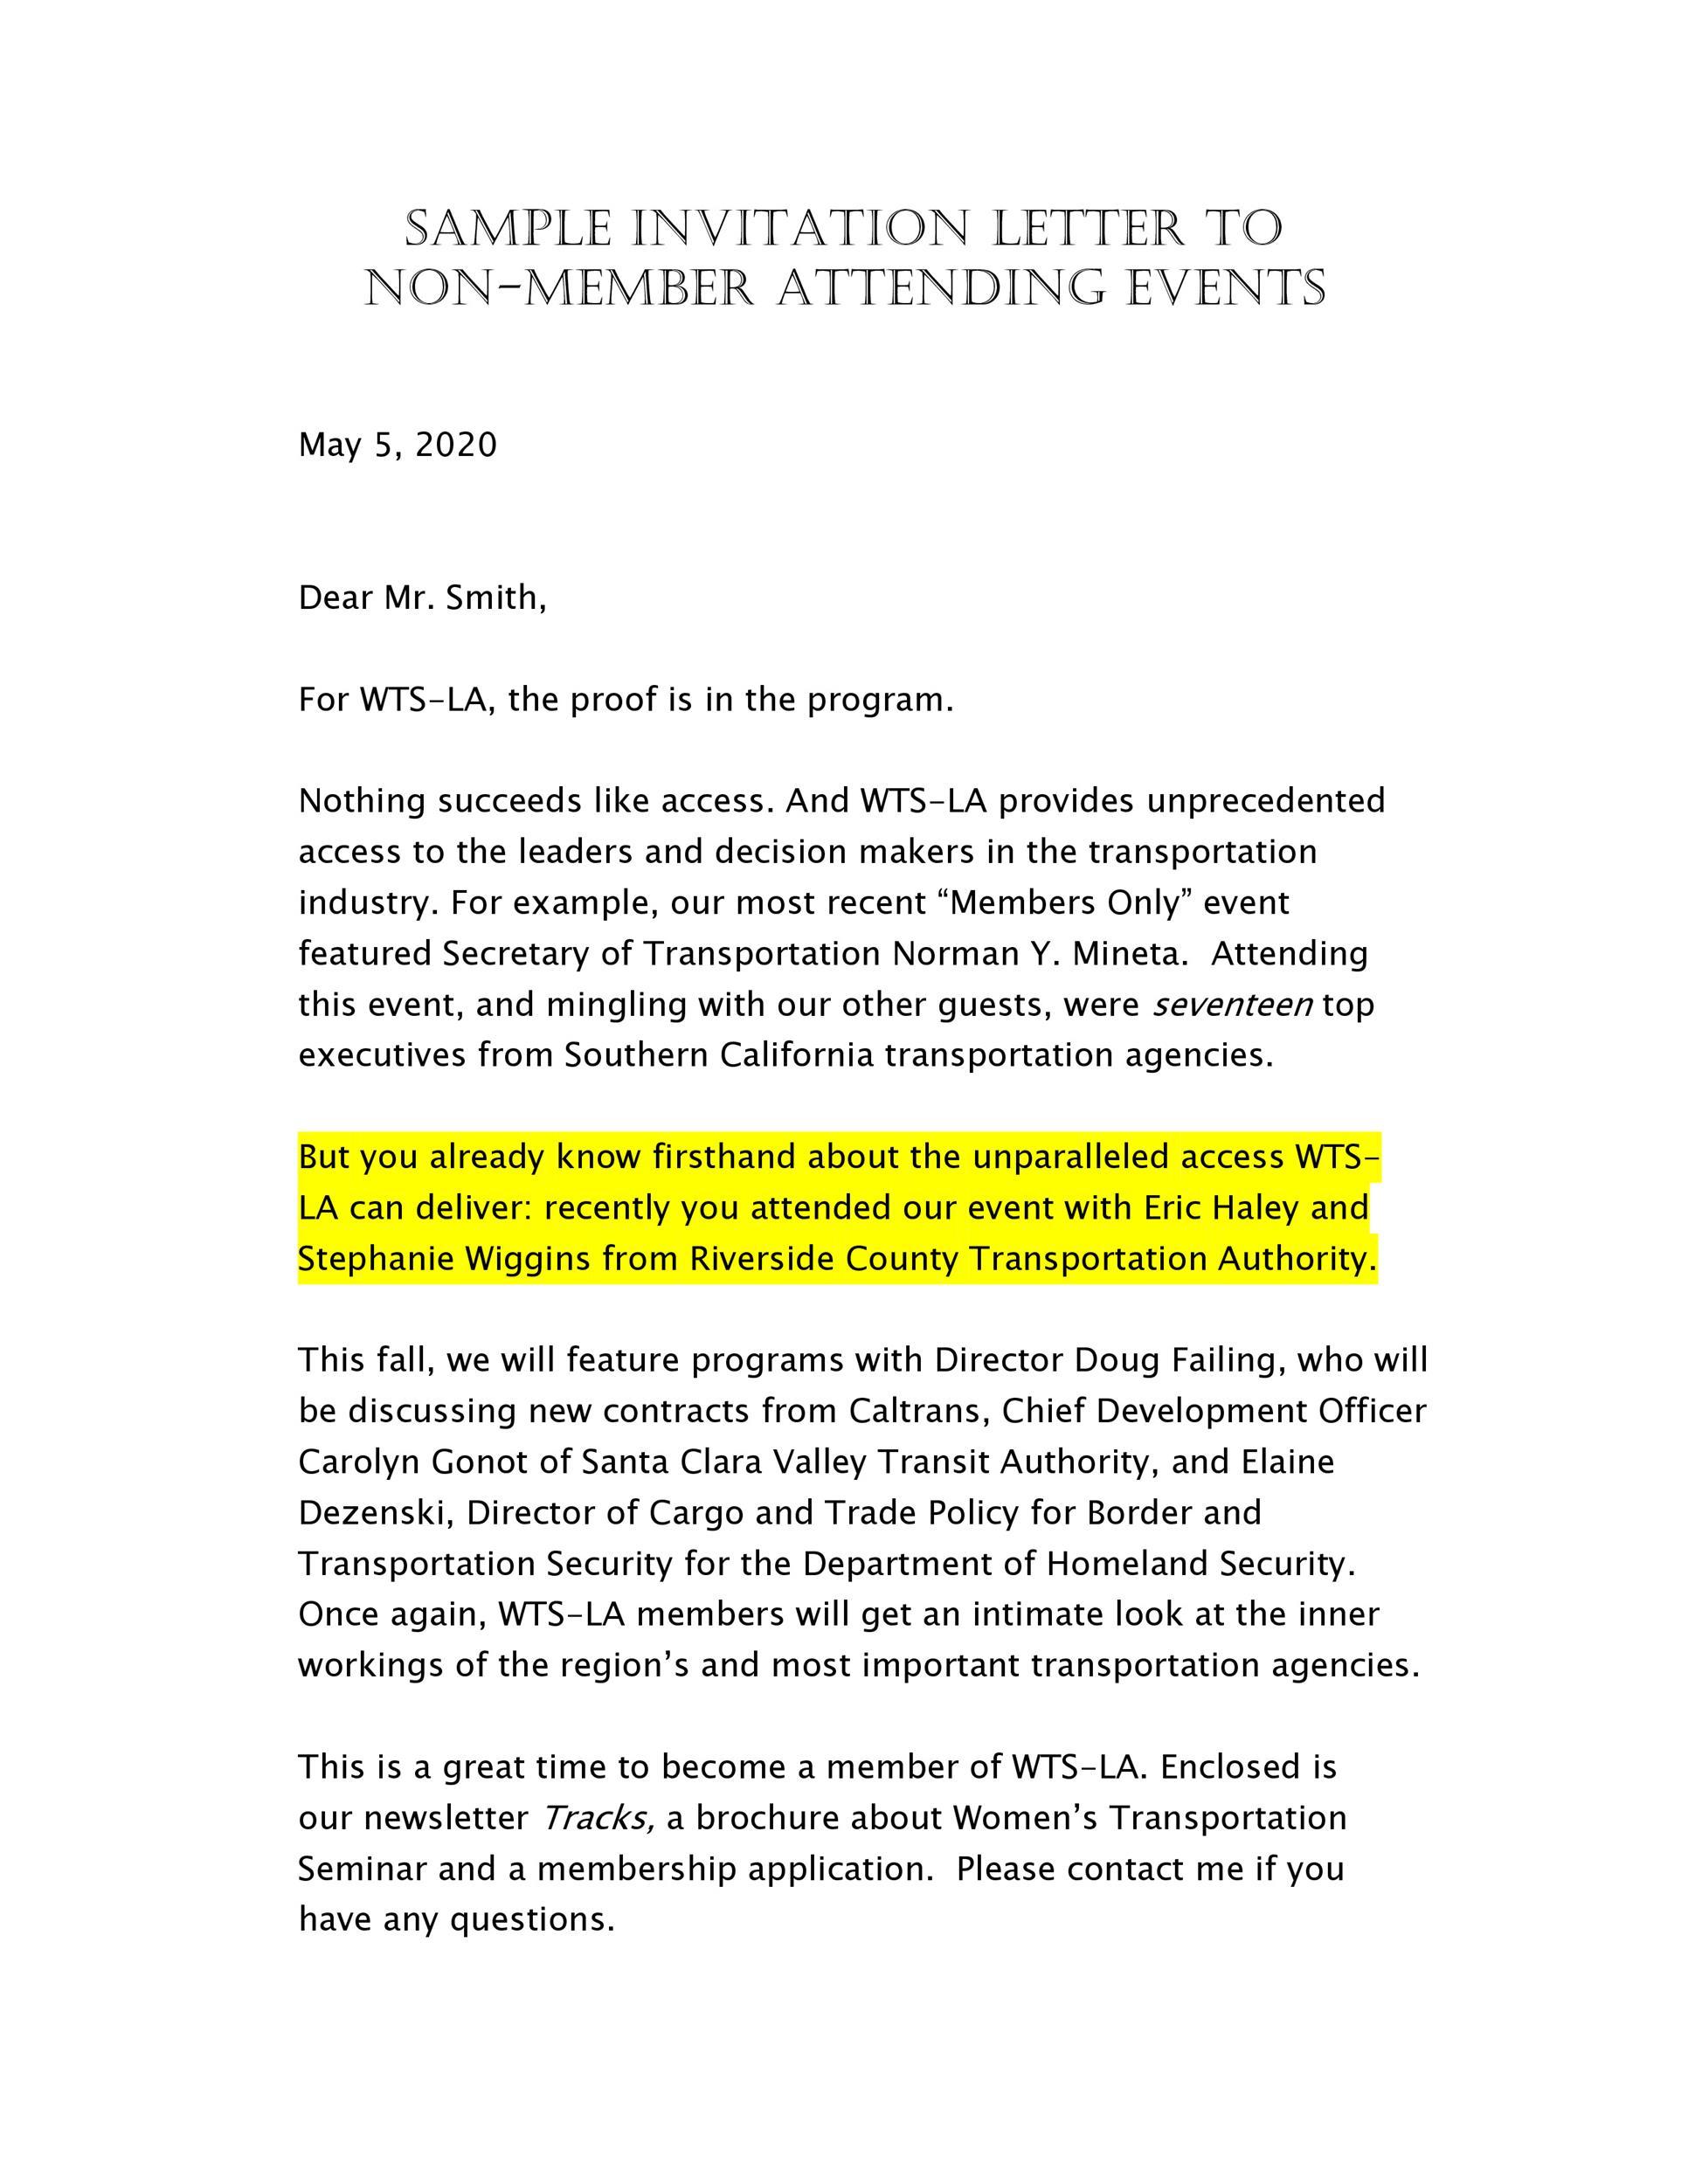 Free invitation letter 16